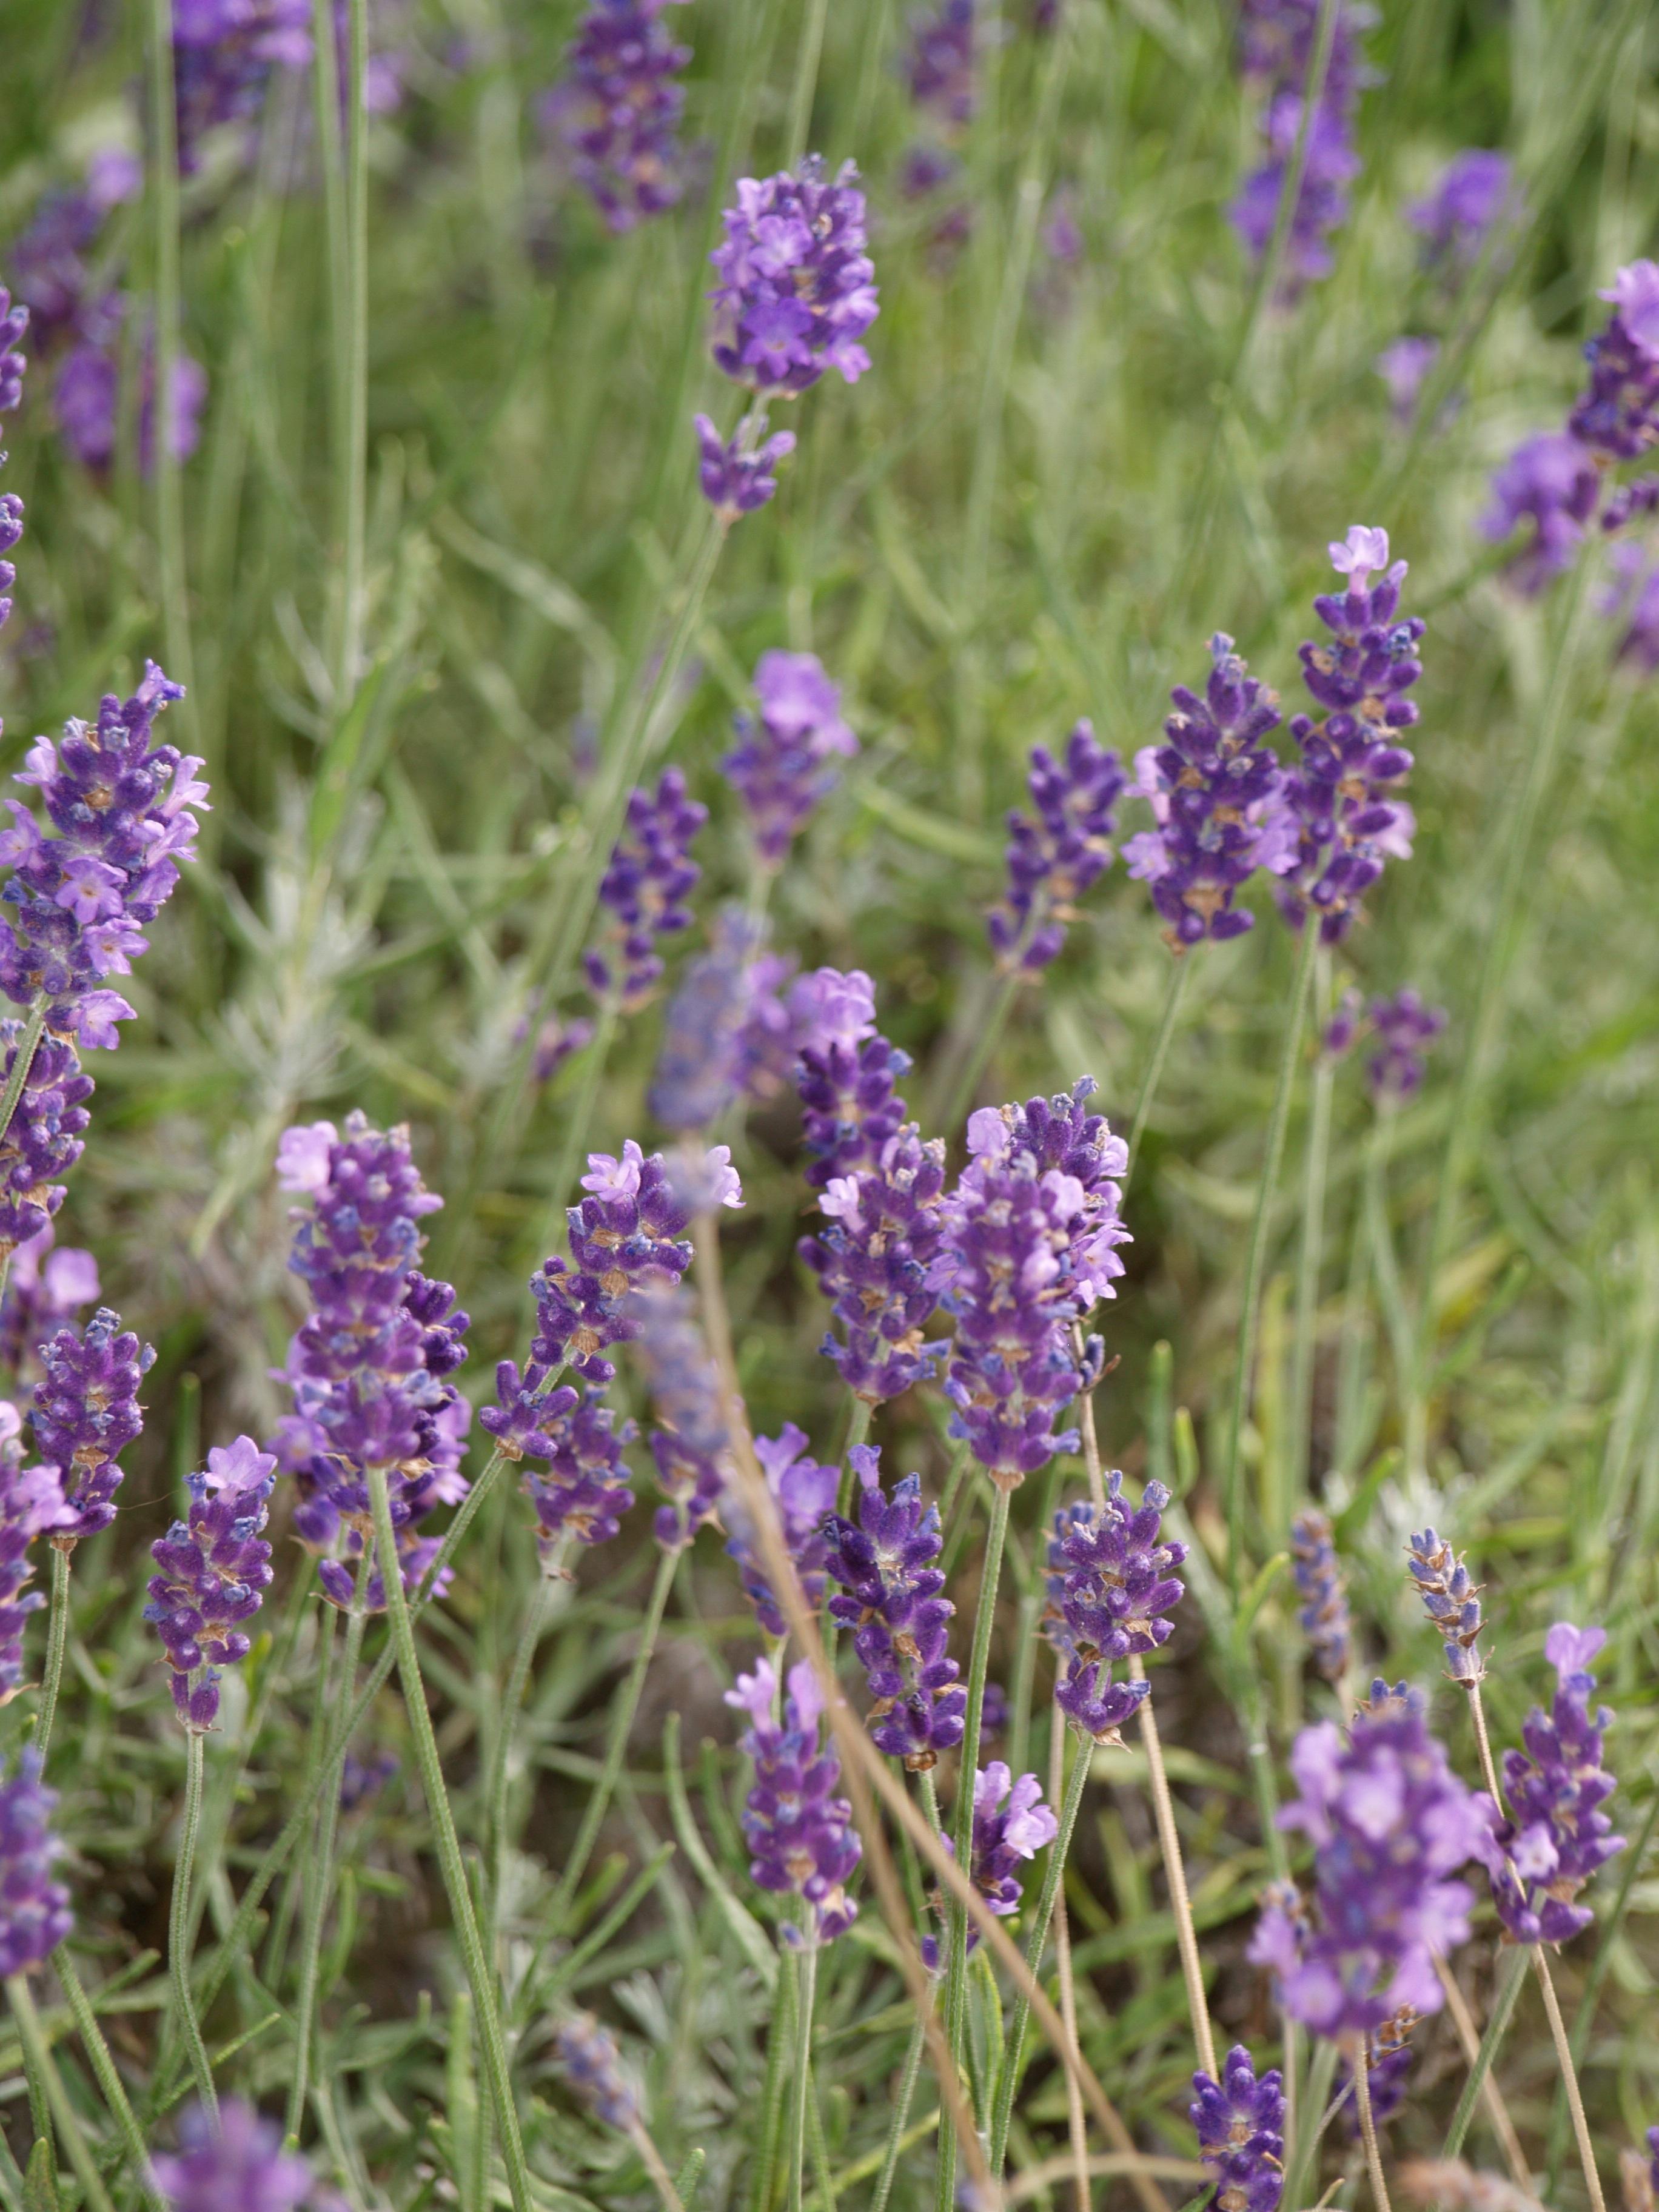 kostenlose foto wiese blume lila sommer kraut flora lavendel wildblume bl hende. Black Bedroom Furniture Sets. Home Design Ideas